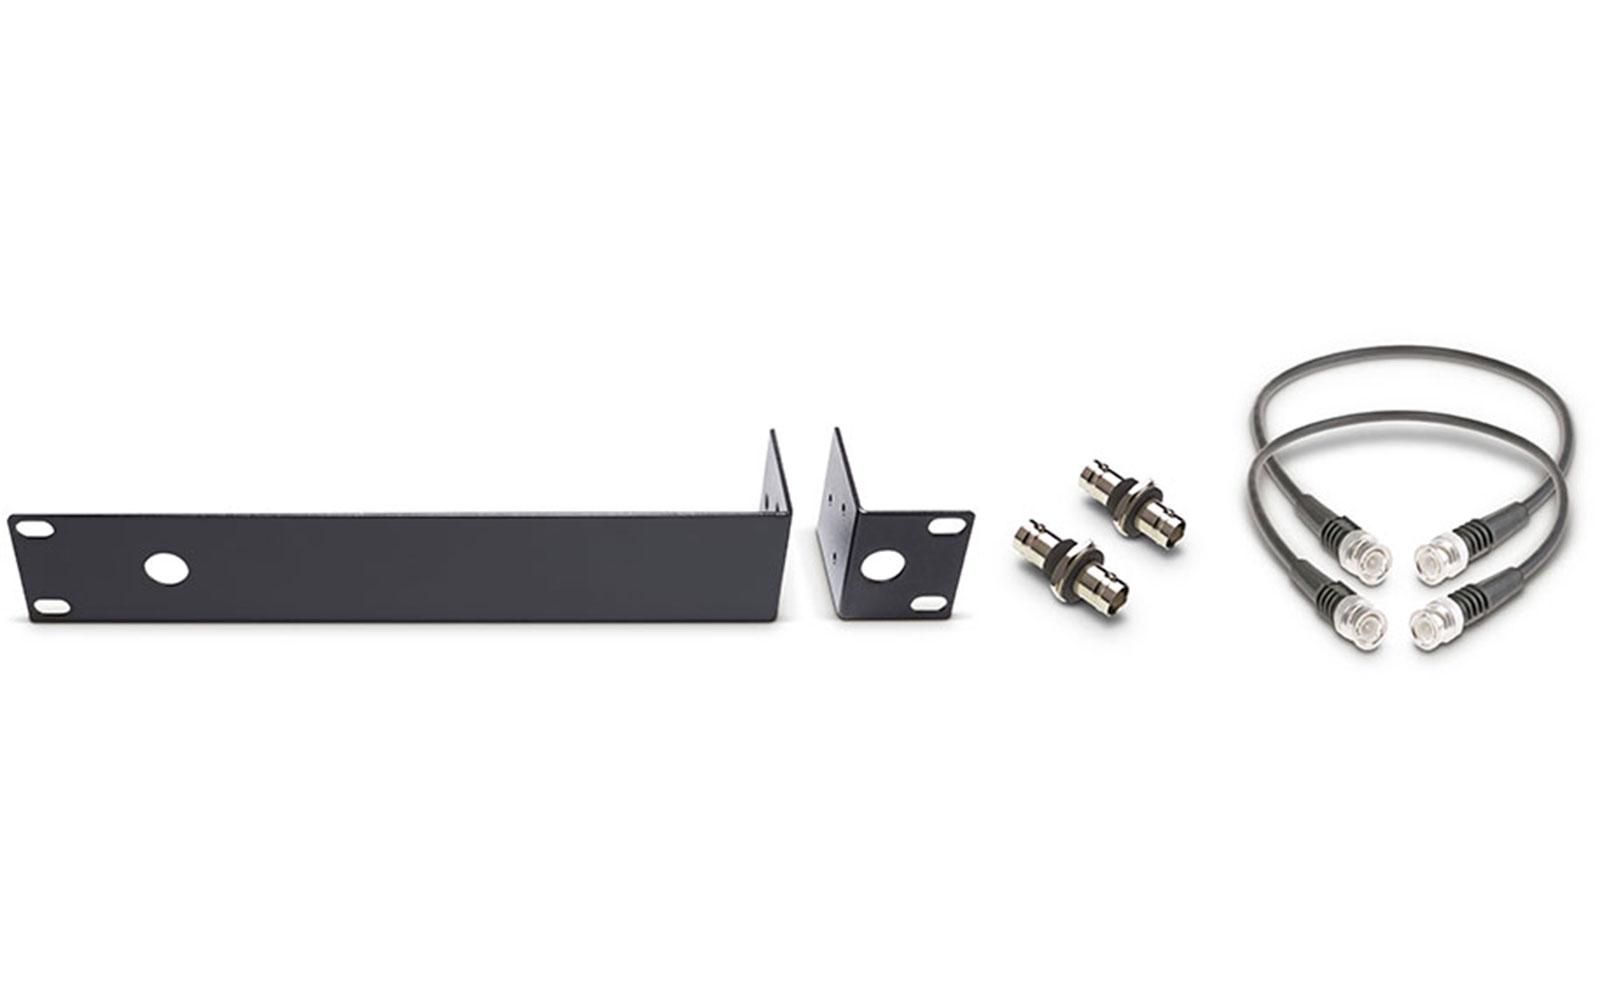 ld-systems-u500-rk-rackmontage-set-fa-r-u500-receiver